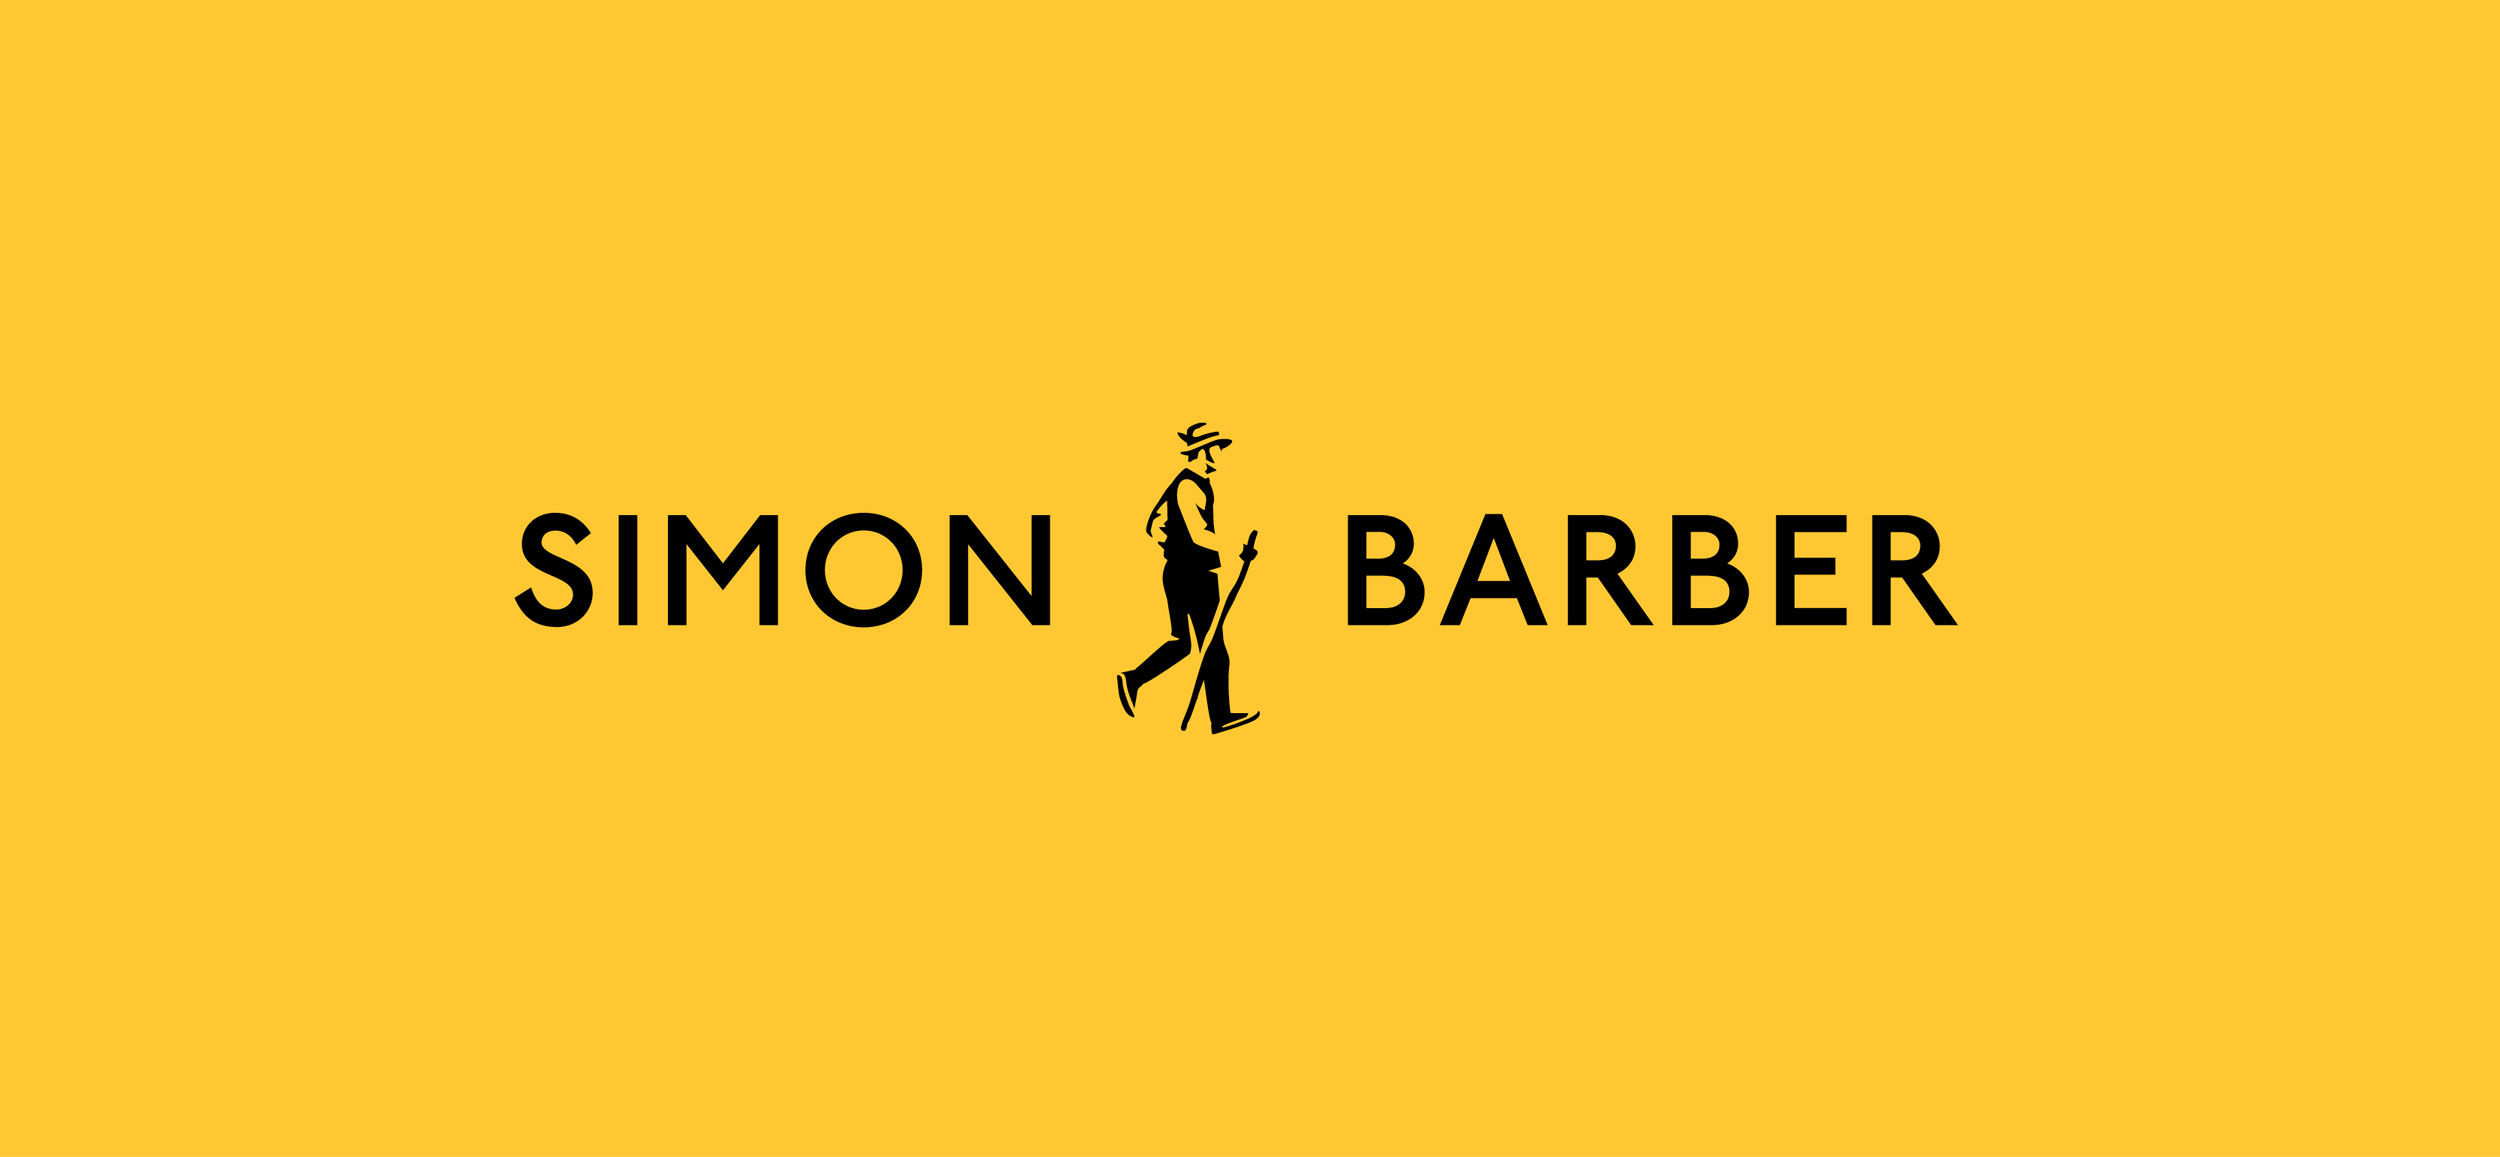 Simon Barber Brand Development